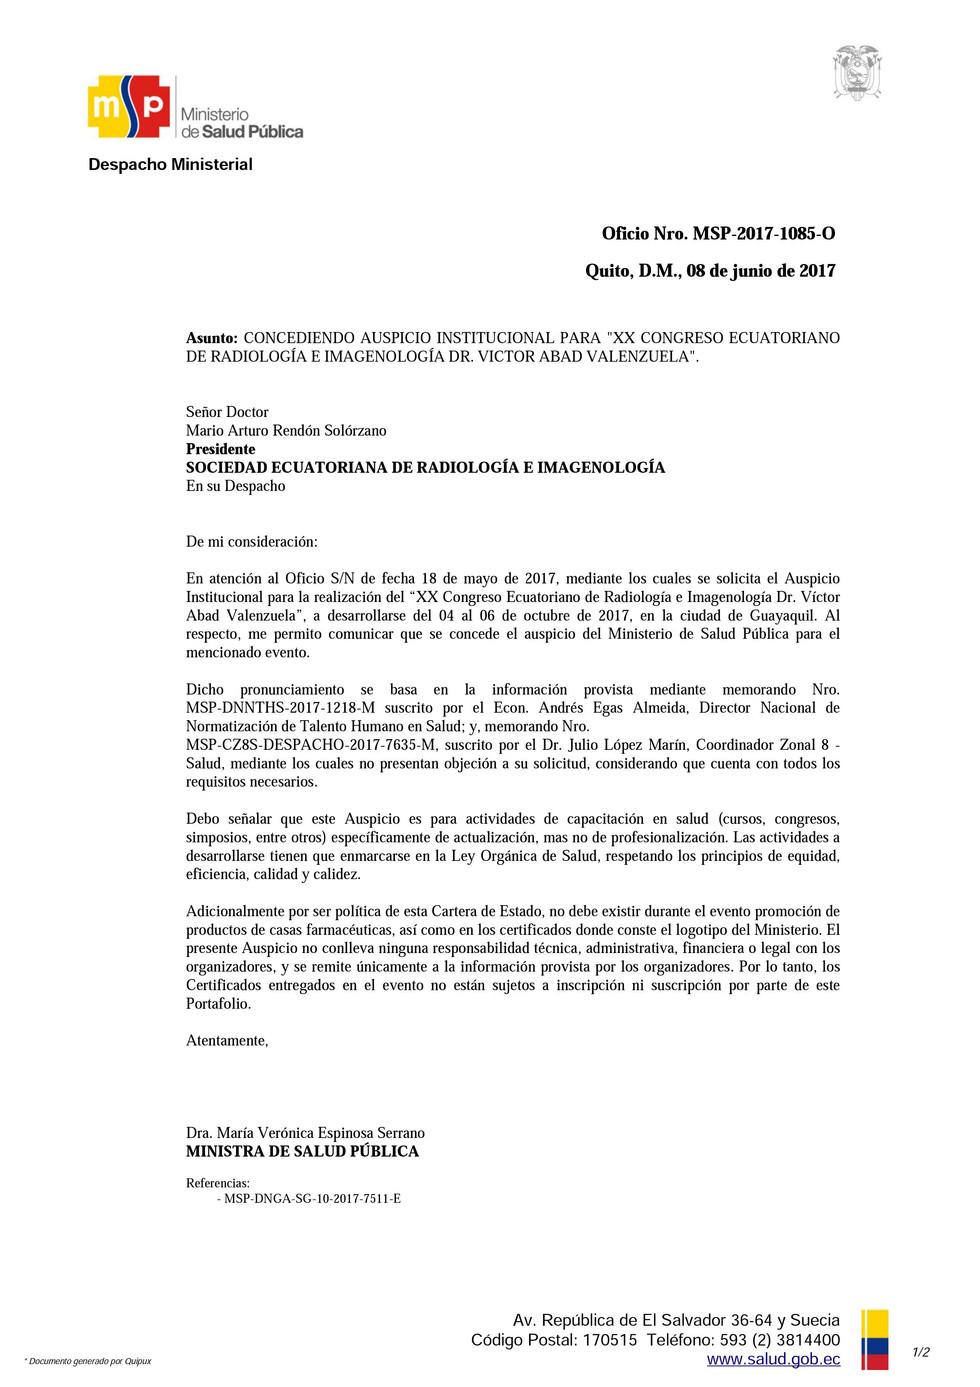 Aval Institucional del Ministerio de Salud Pública